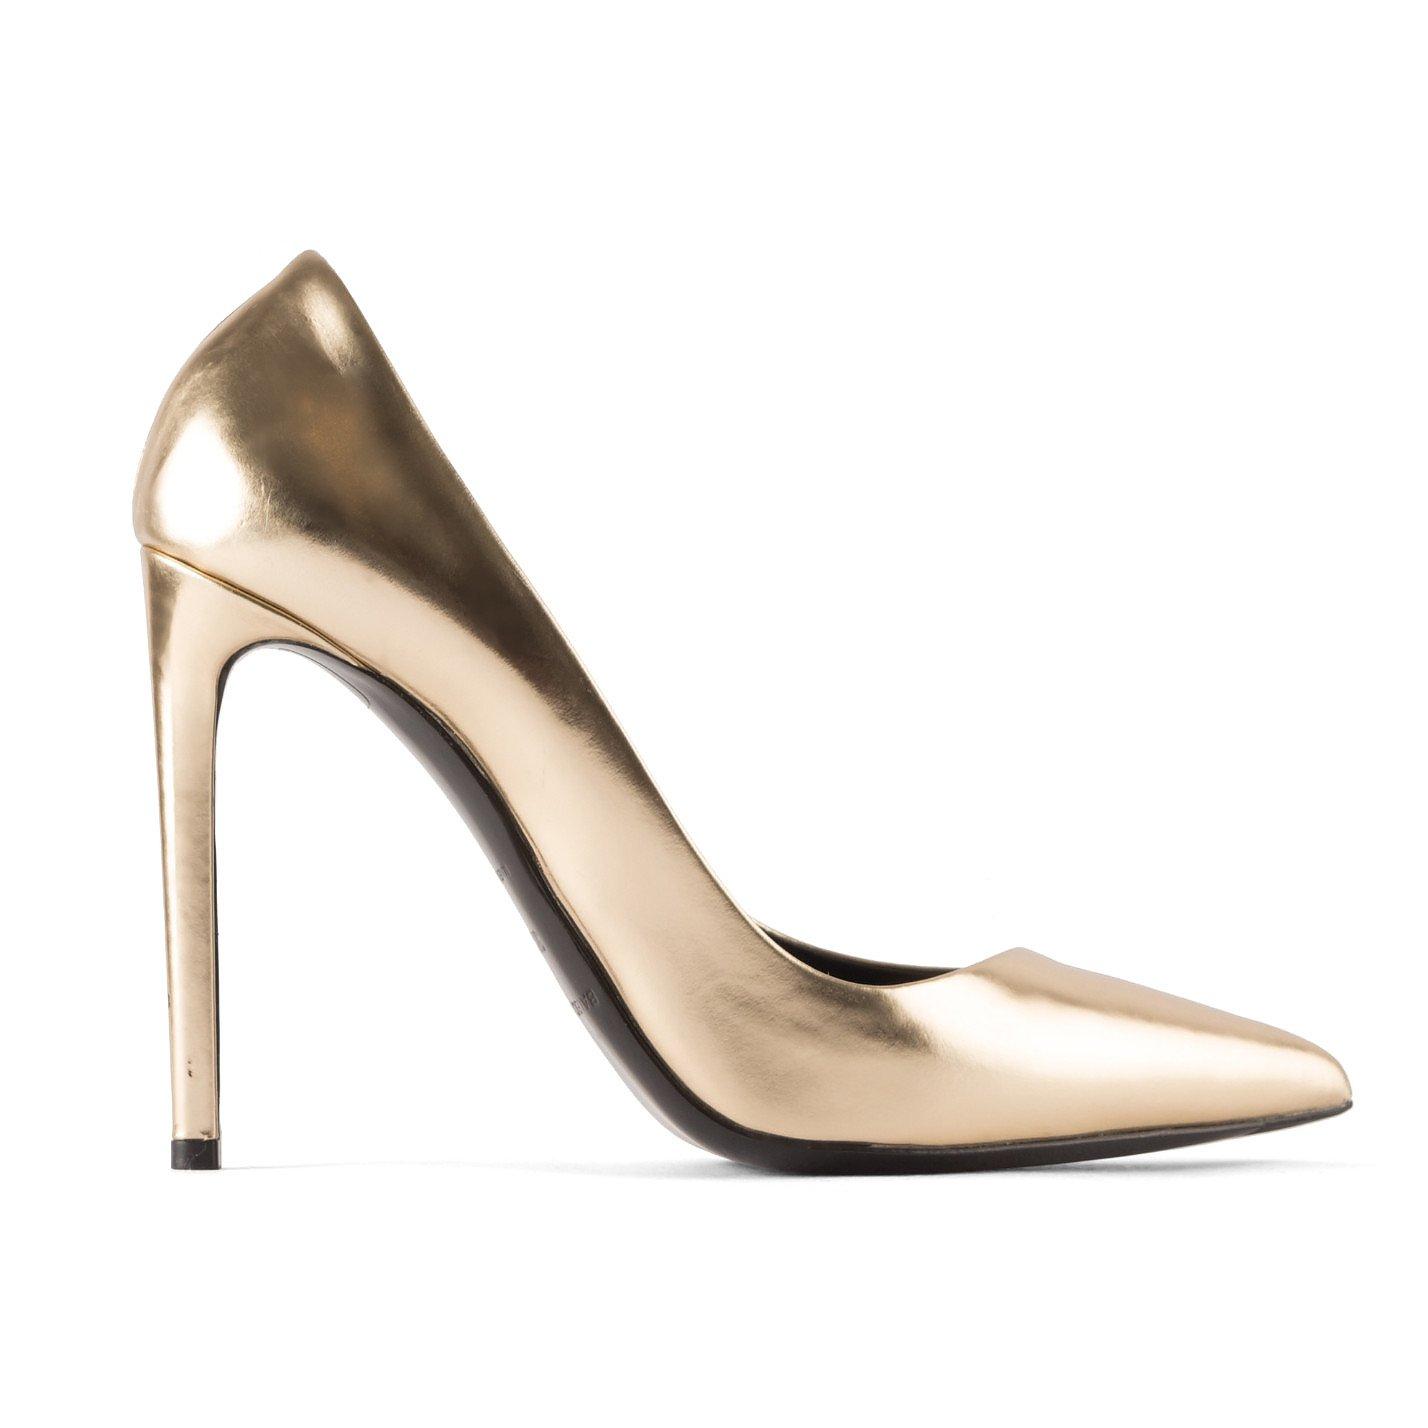 Balenciaga All Time Metallic Leather Court Shoes